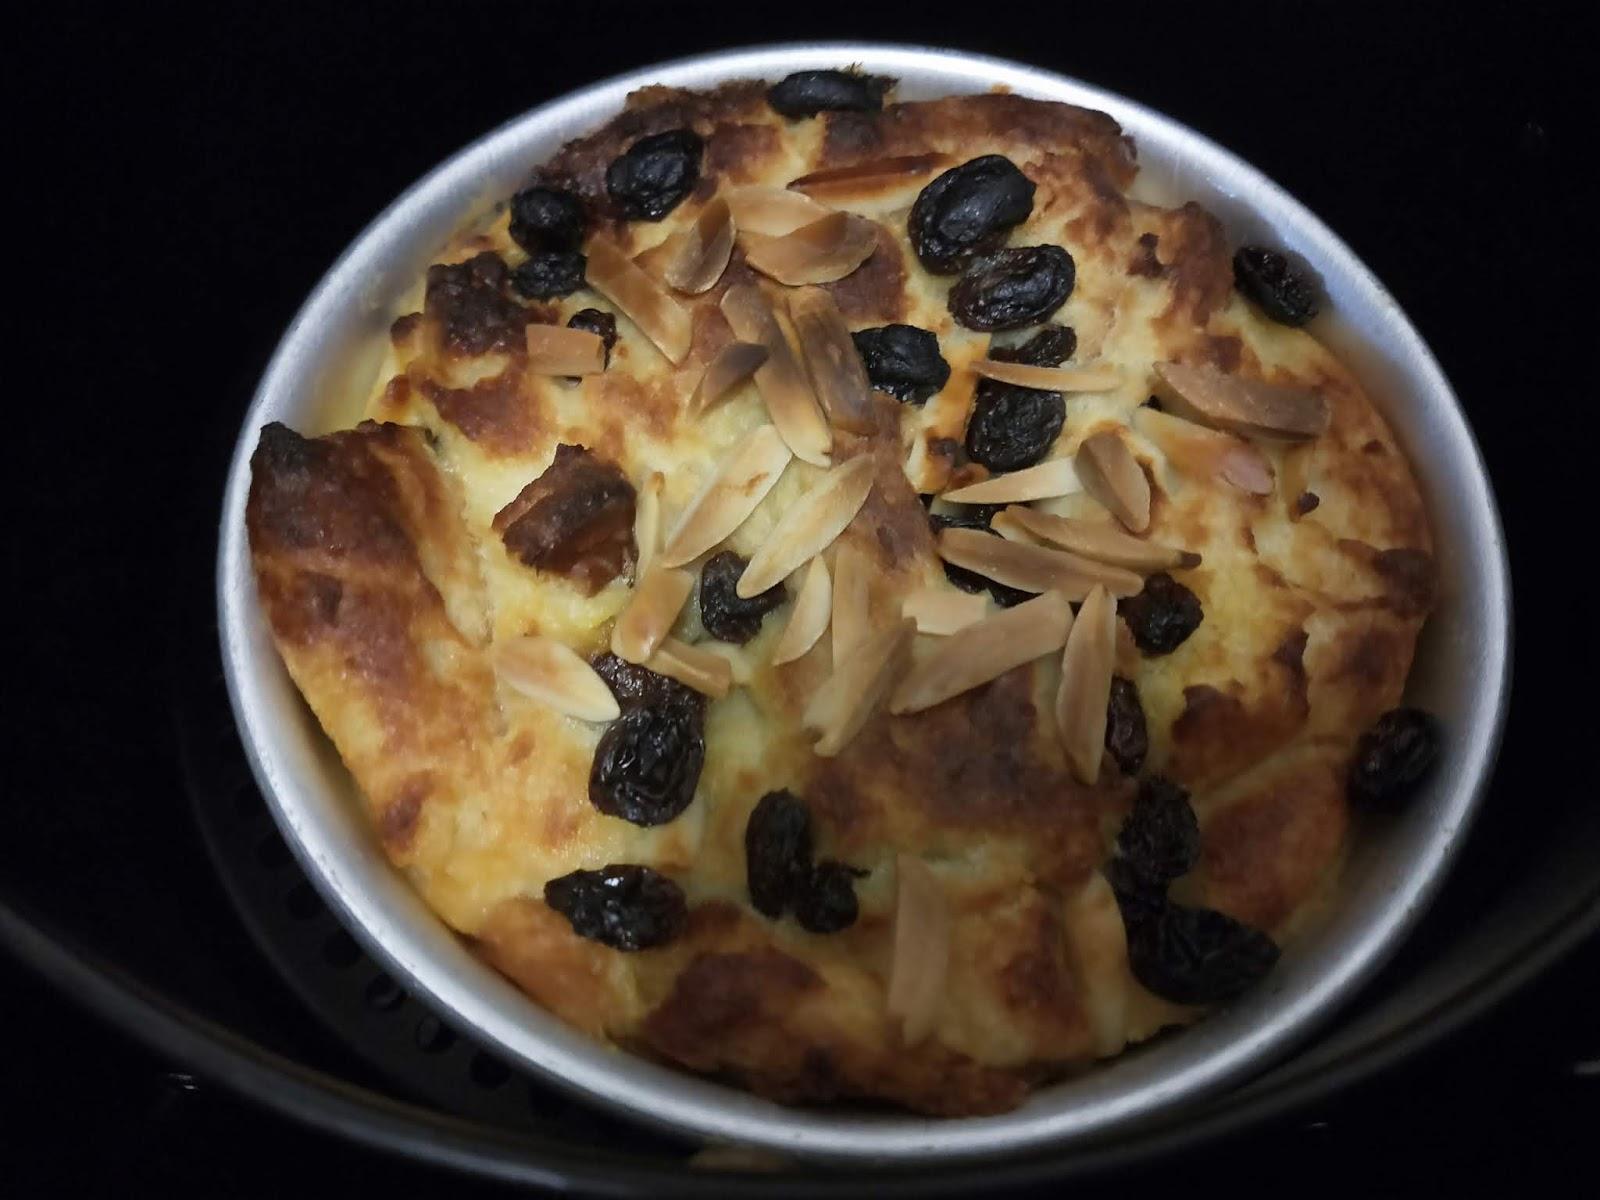 resepi puding roti air fryer sos kastard ieyracom Resepi Puding Roti Air Fryer Enak dan Mudah